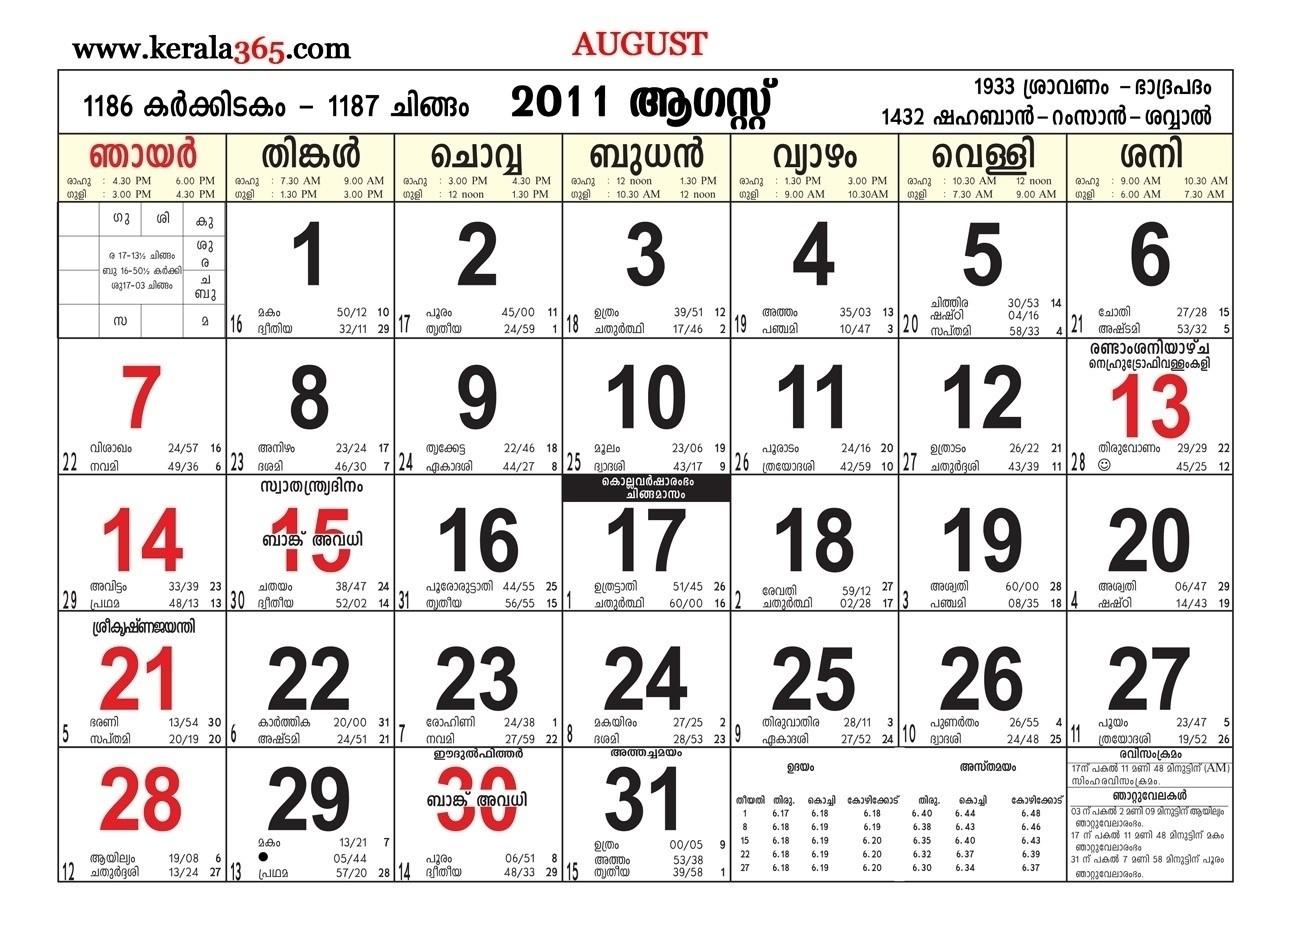 1996 August 29 Malayalam Calendar - Calendar Inspiration Design  Calendar 2001 Malayalam August Image